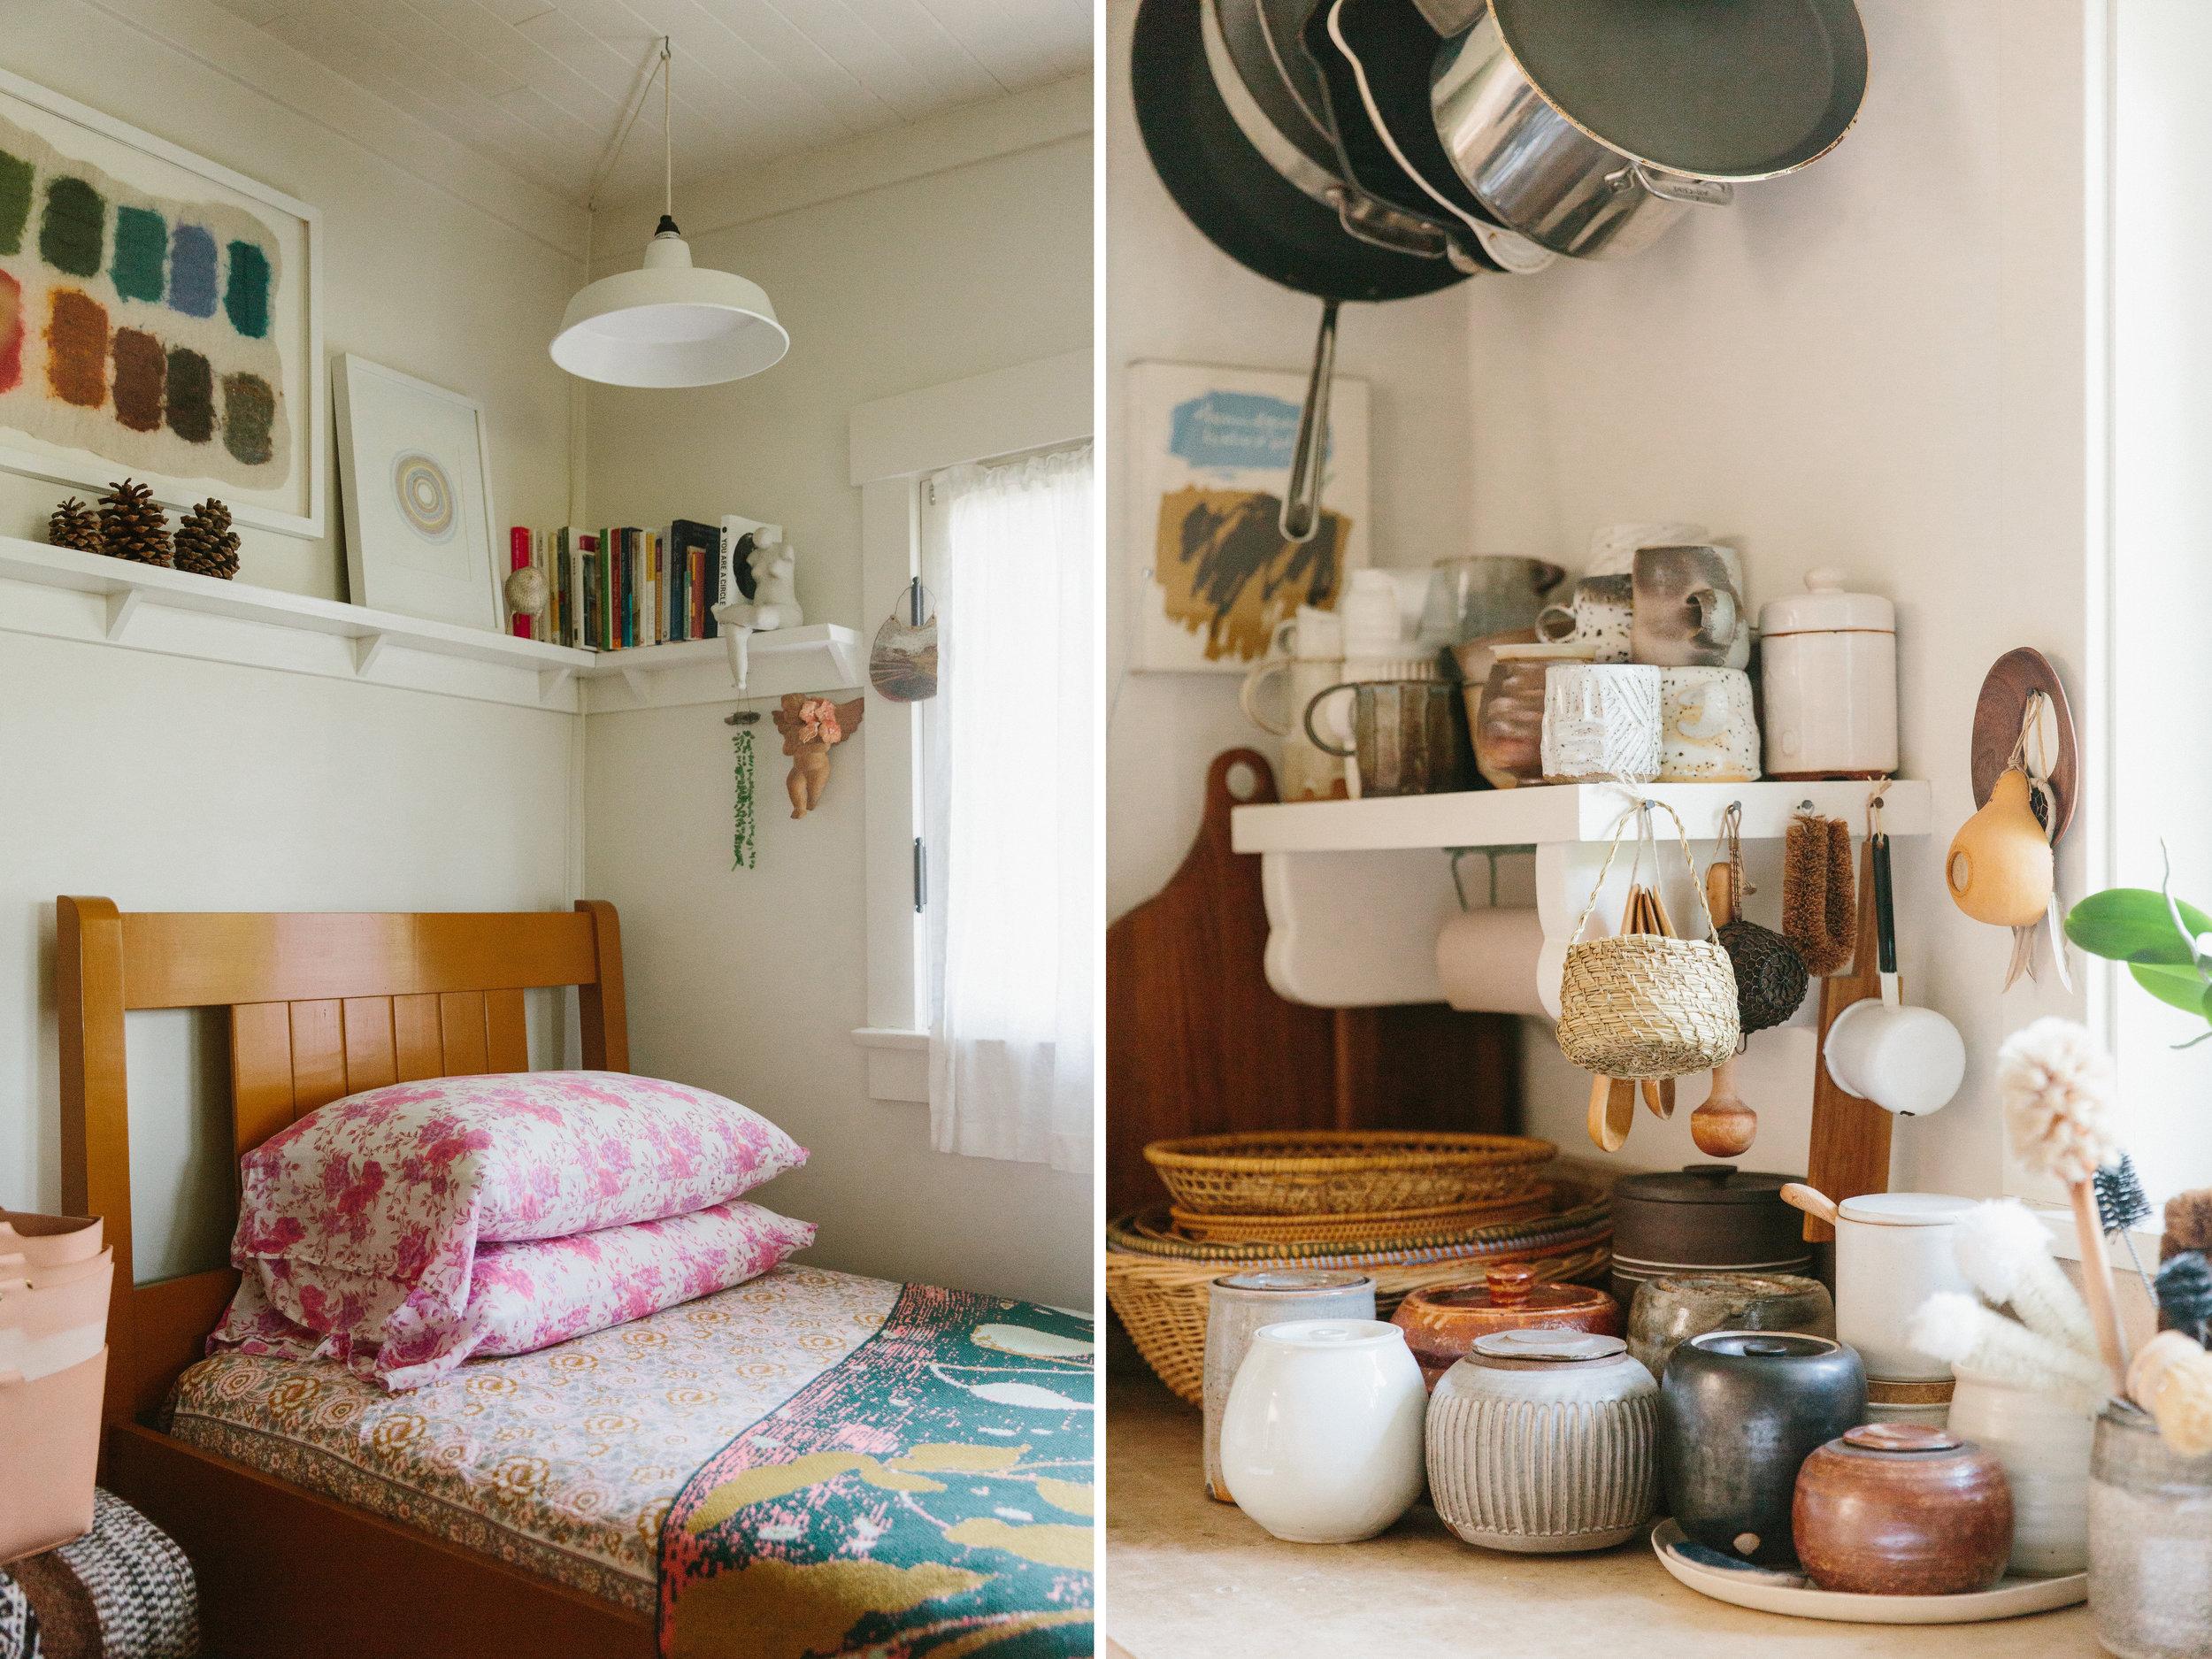 mt-washington-pottery_jenni-kayne_los-angeles-editorial-studio-home-tour_nicki-sebastian_9.jpg